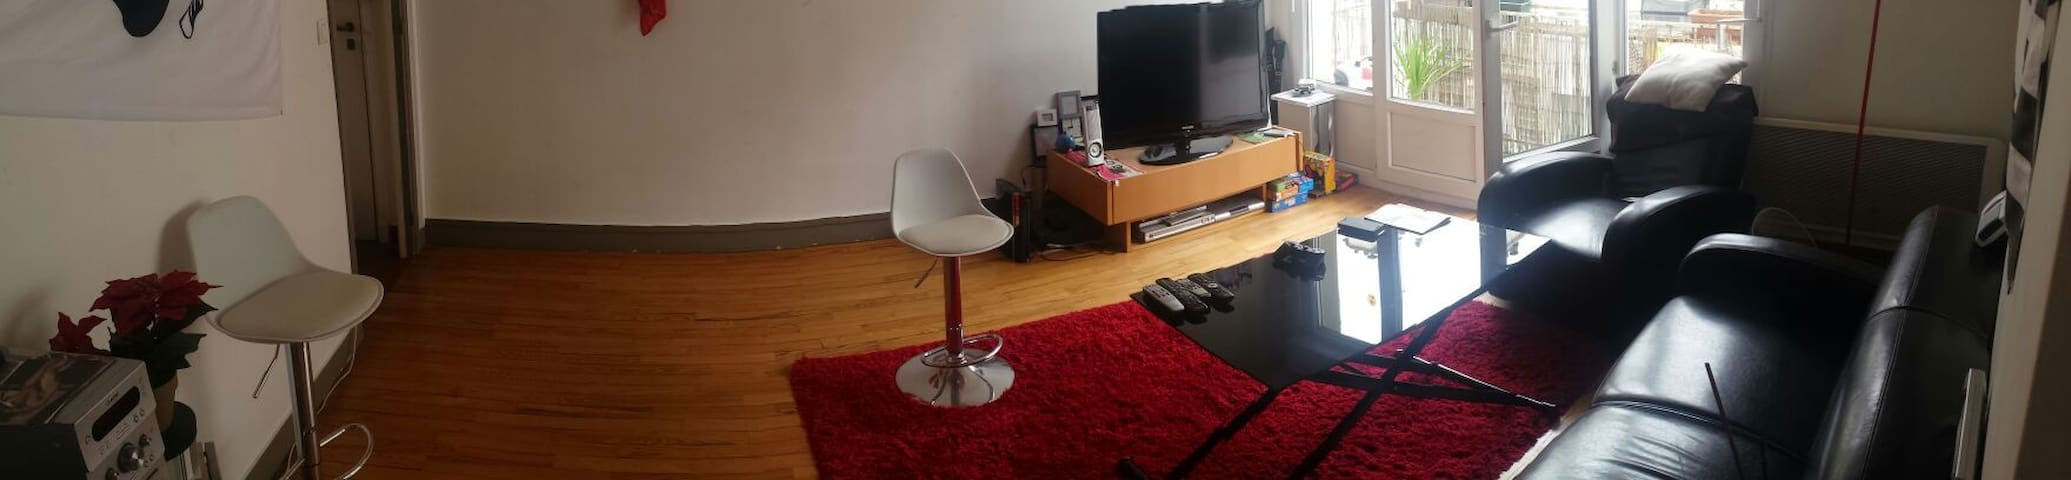 Apparemment  vannes 60 m2 - Vannes - Apartamento